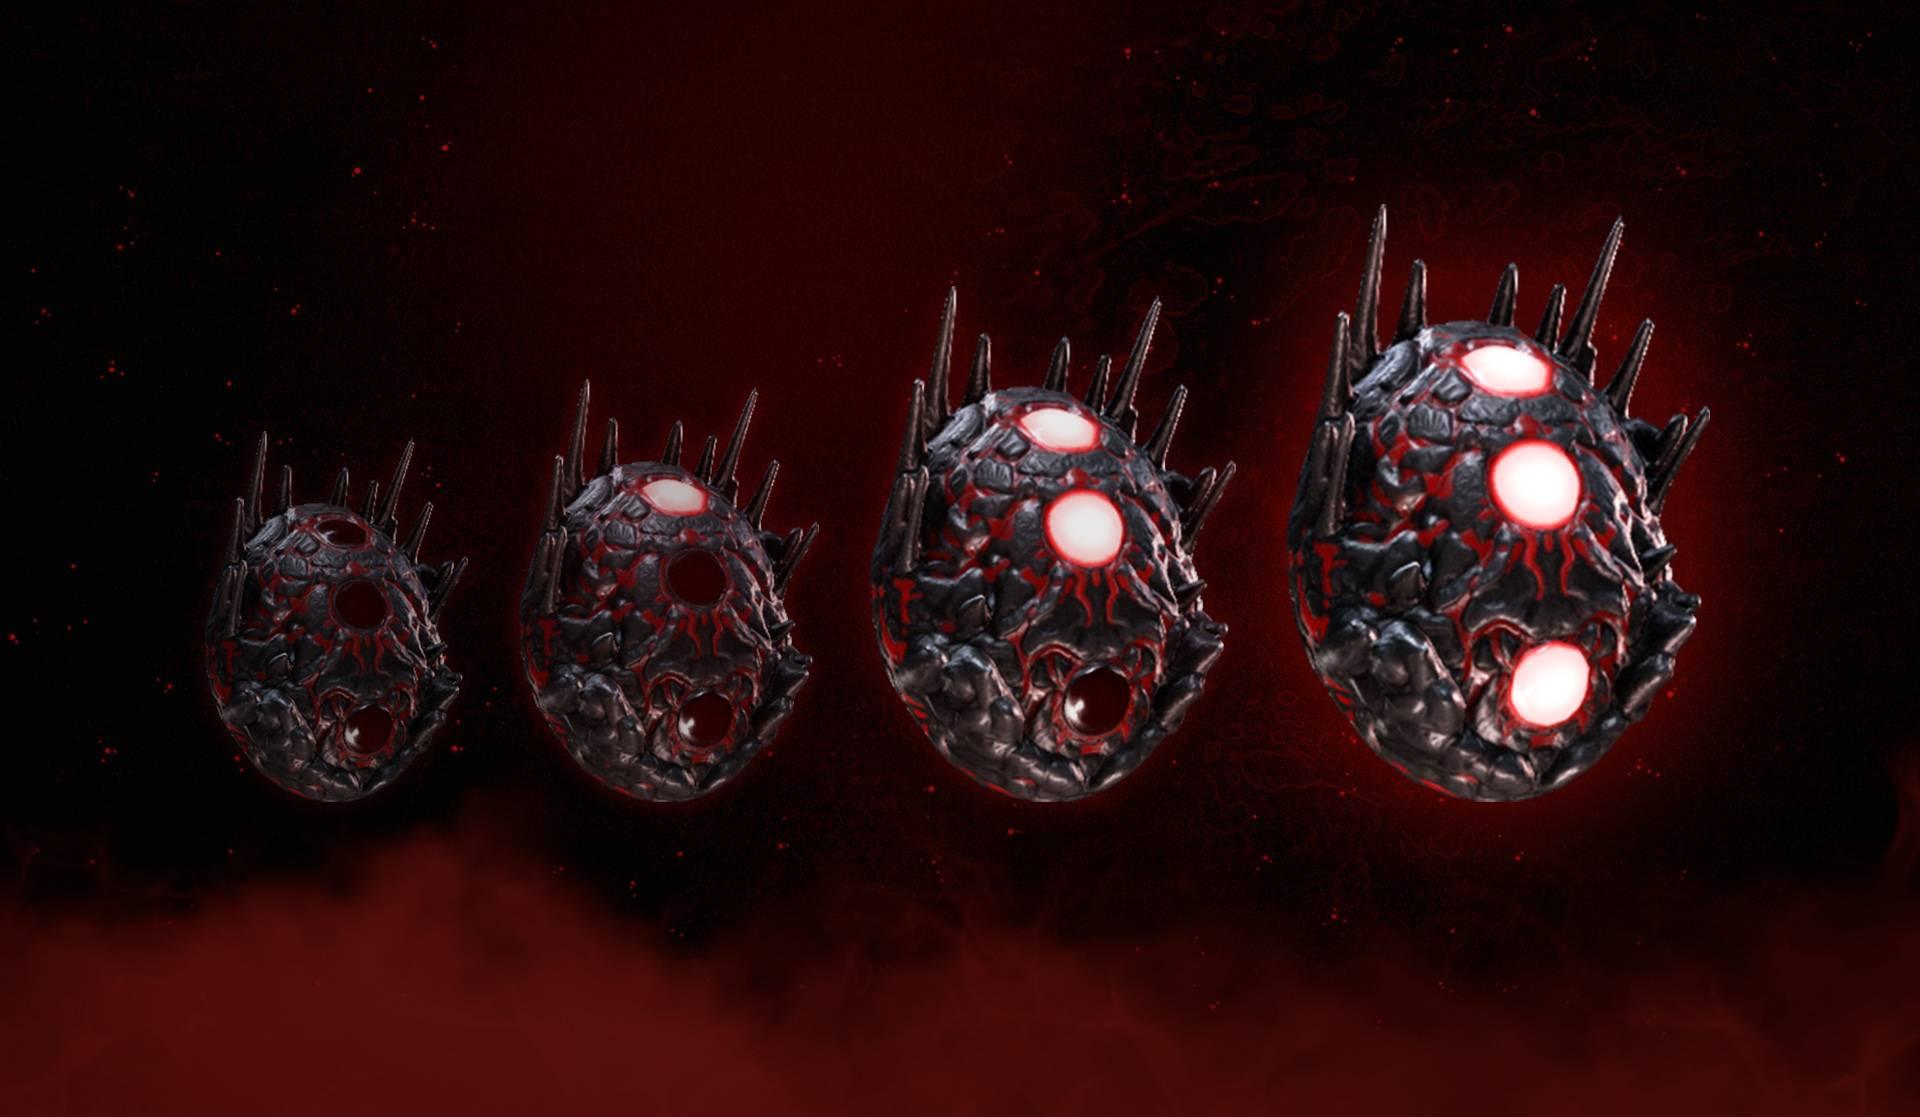 72fc0e0174065589347f2d75d50908c9 - Update 26: The Old Blood